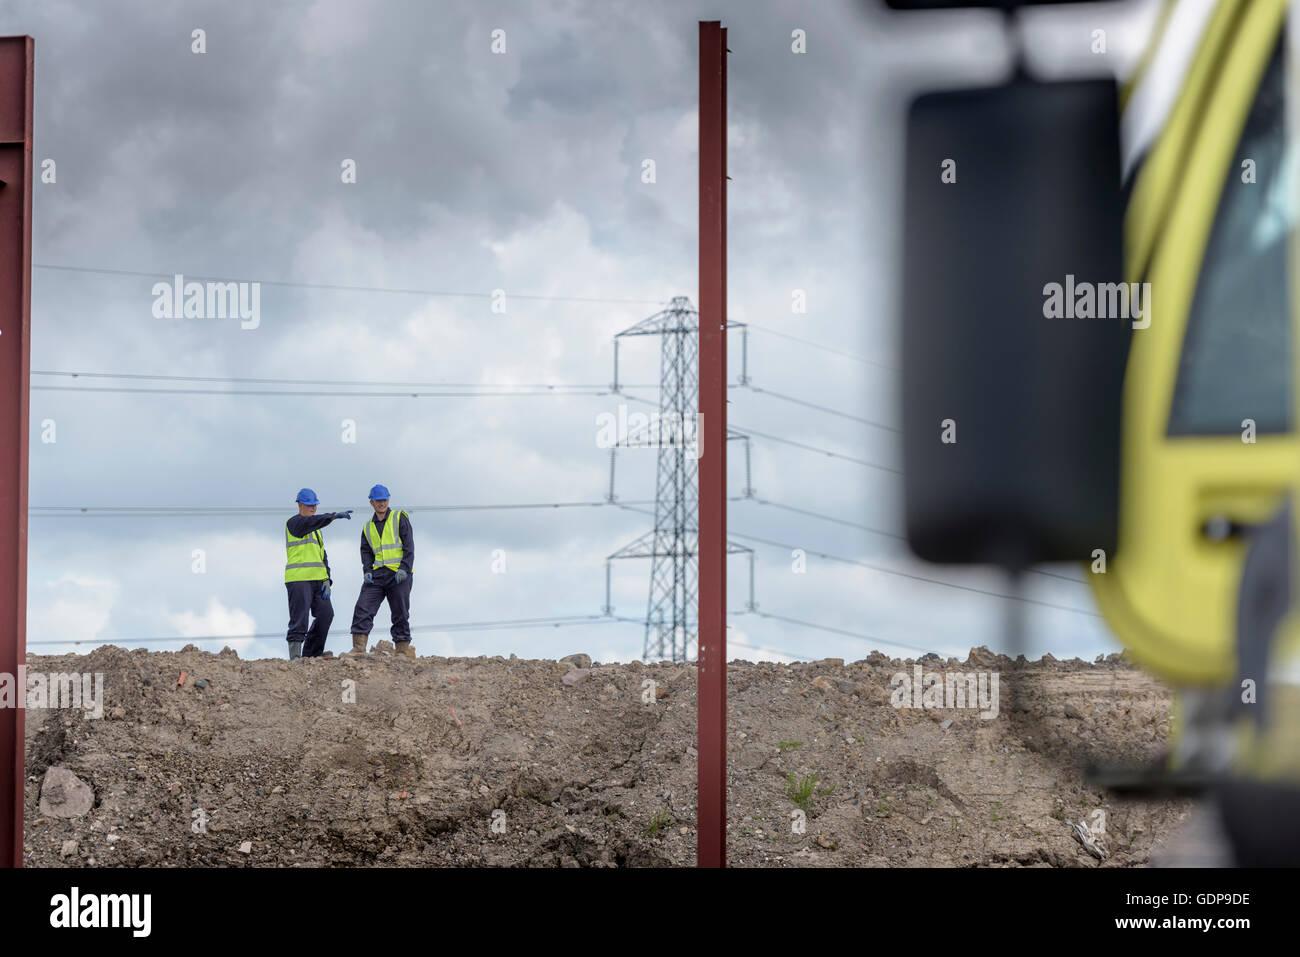 Apprentice builders inspecting building site - Stock Image